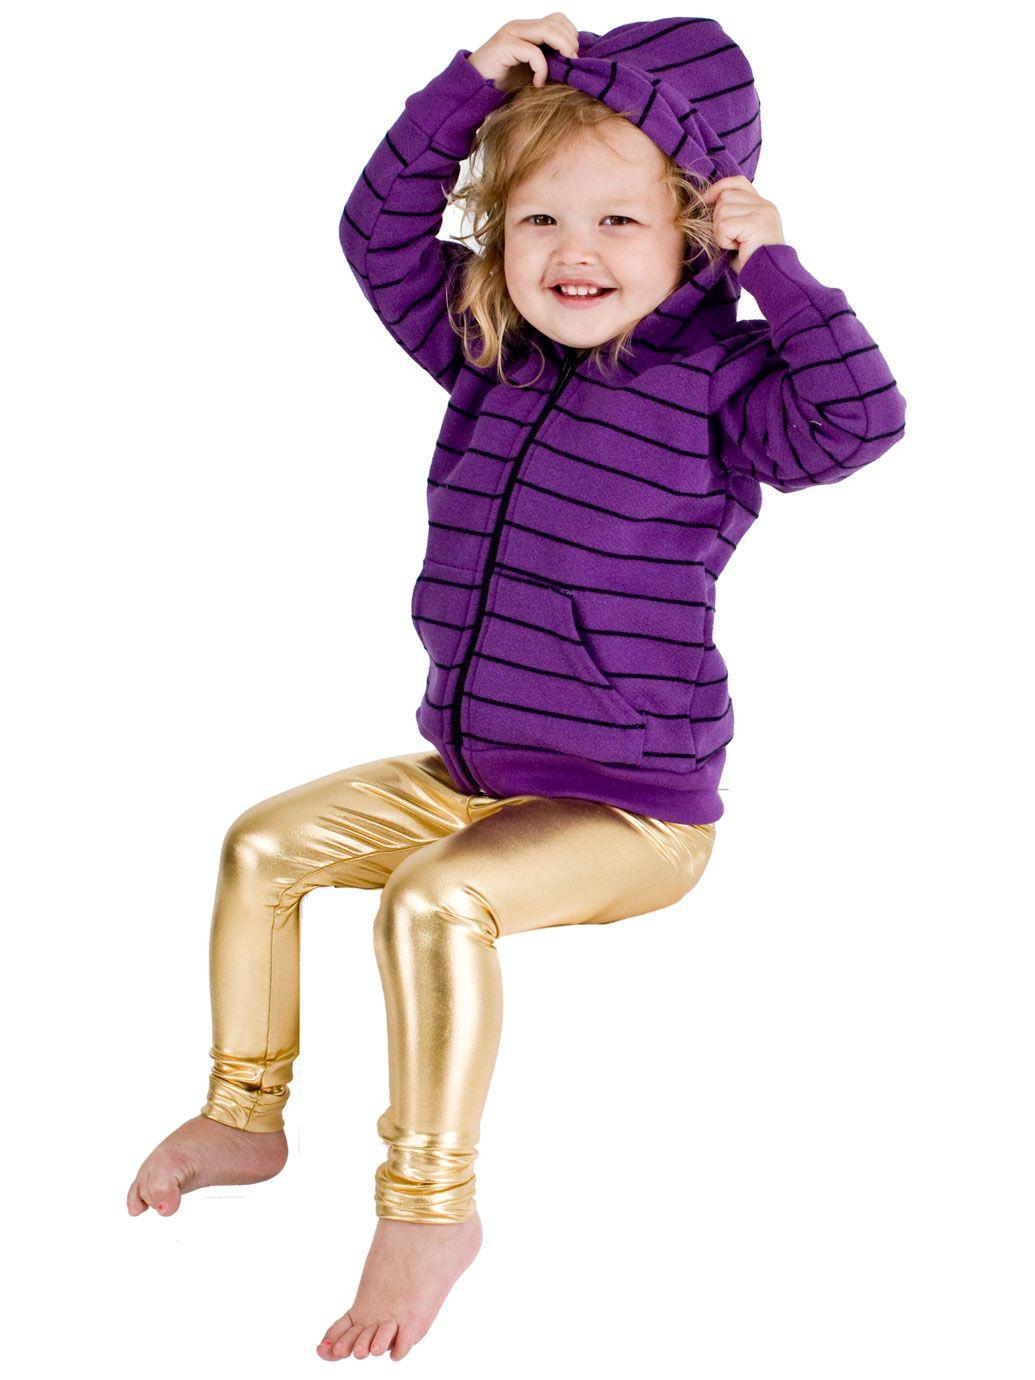 This is seriously a Giulietta's hoody!! $26 Kids Striped Fleece Zip Hoodie | 2 - 6 Years | Kids & Babies' Sweatshirts & Outerwear | American Apparel